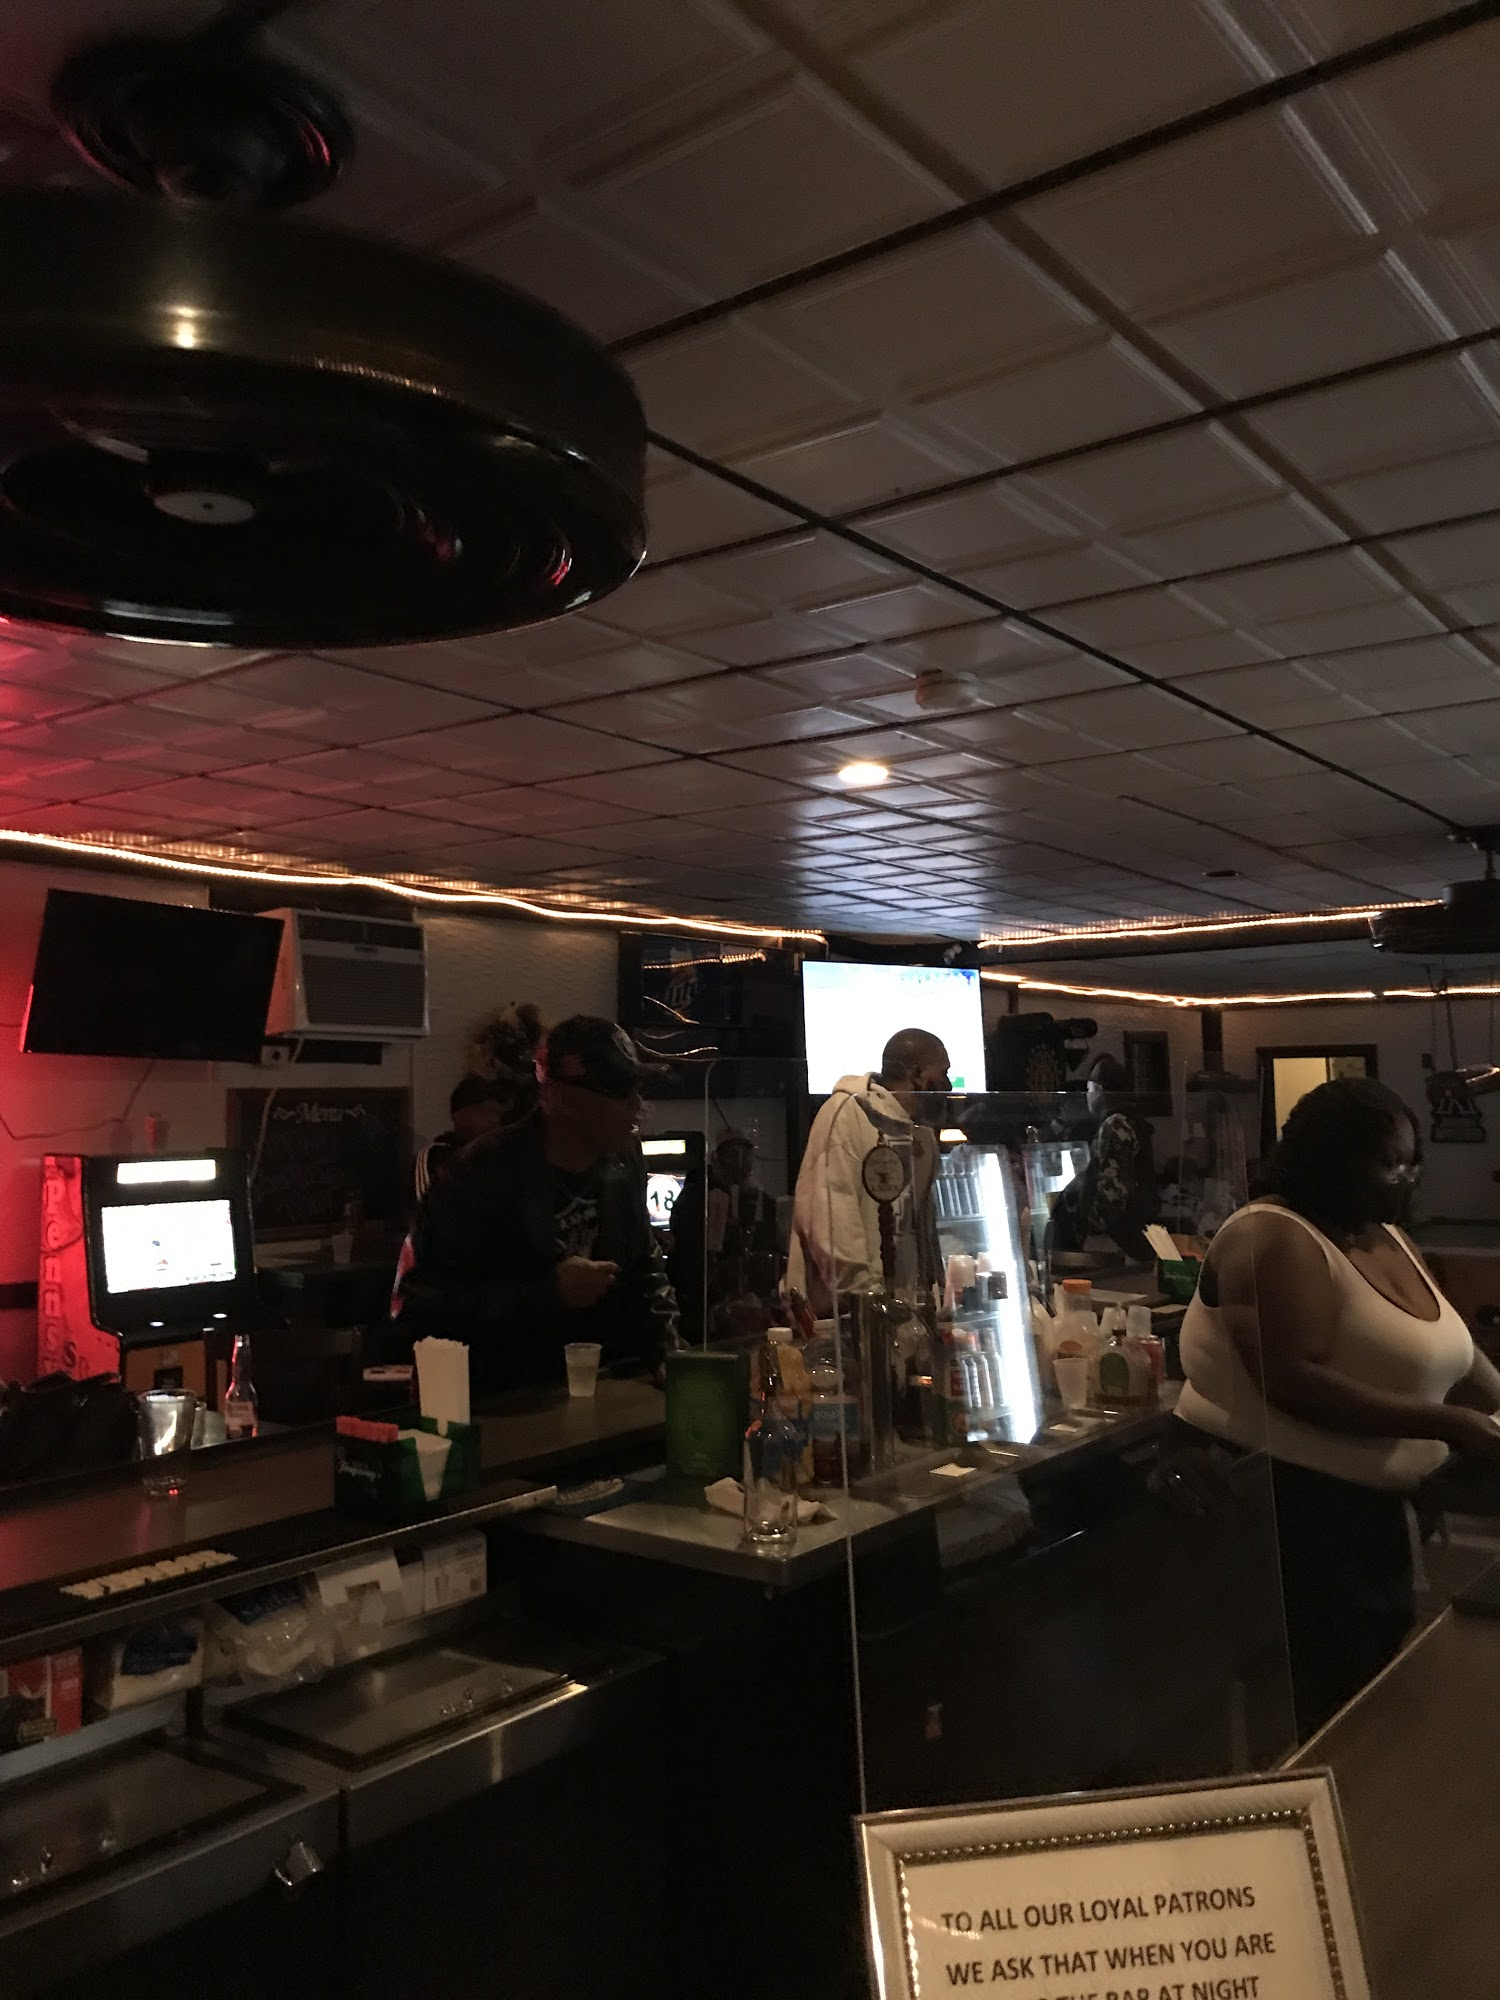 Best Local Restaurants In Rochester Pa Jul 2021 Restaurantji